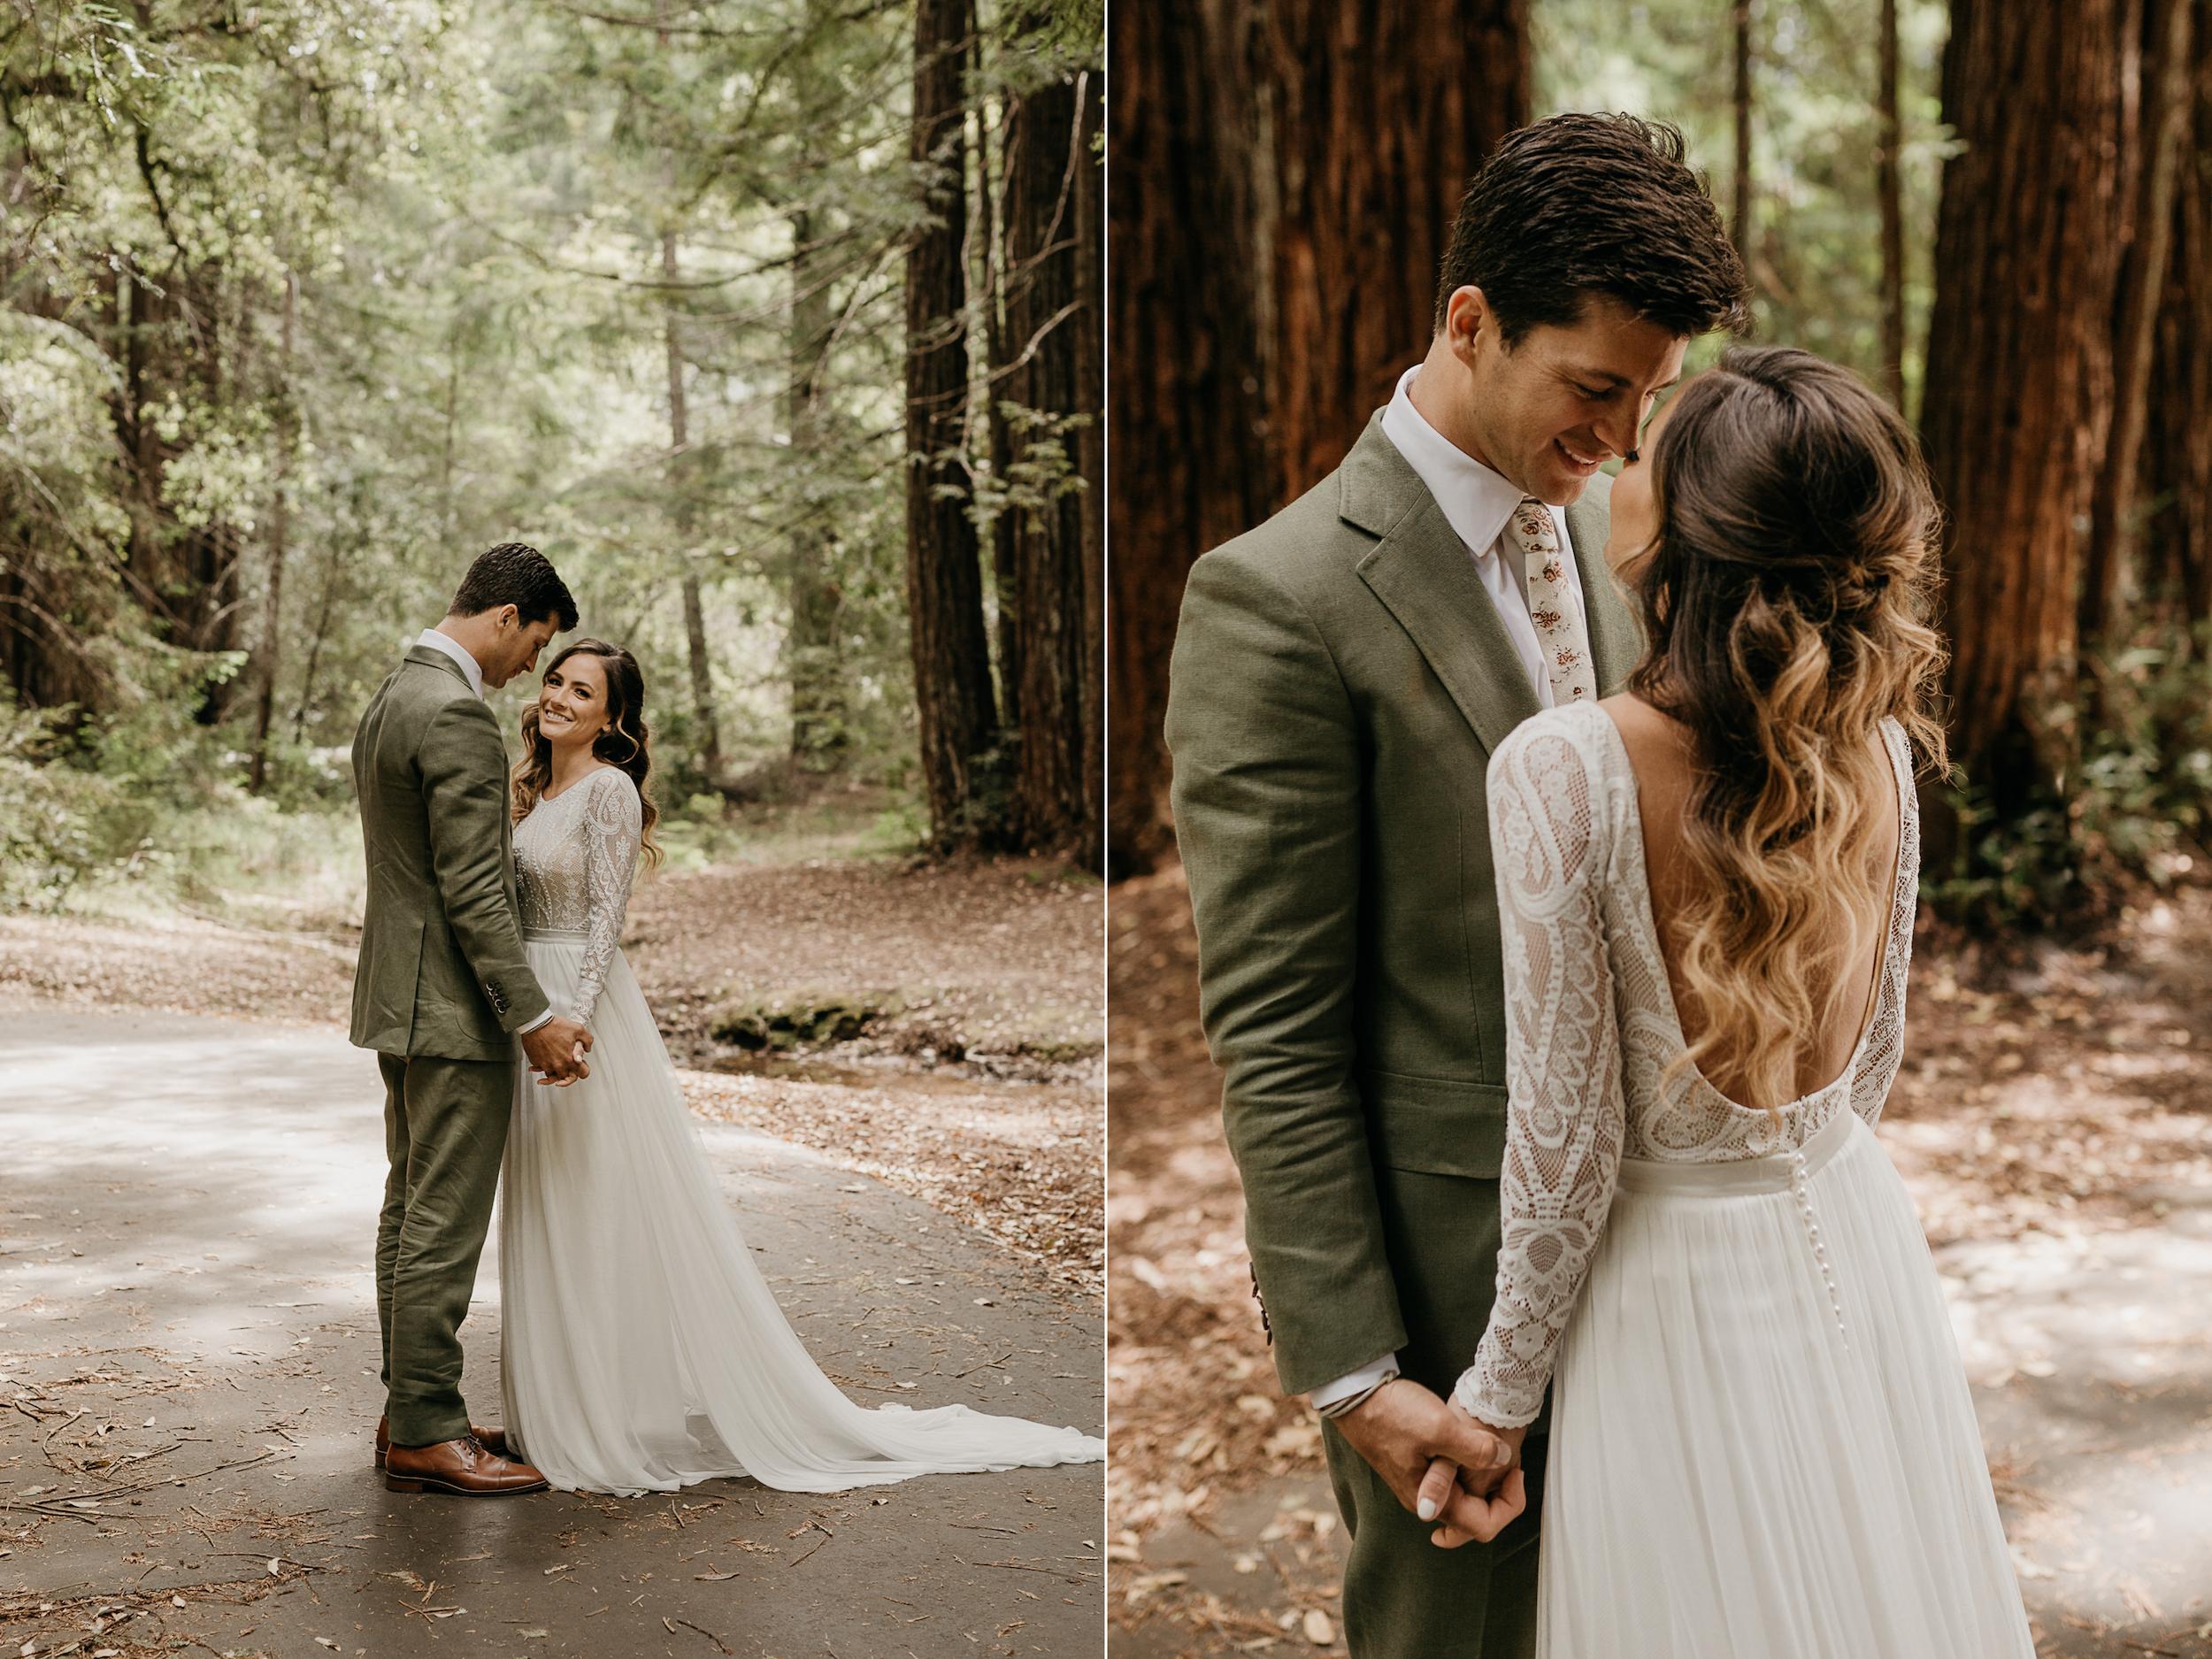 camp campbell-wedding-photographer 014.jpg